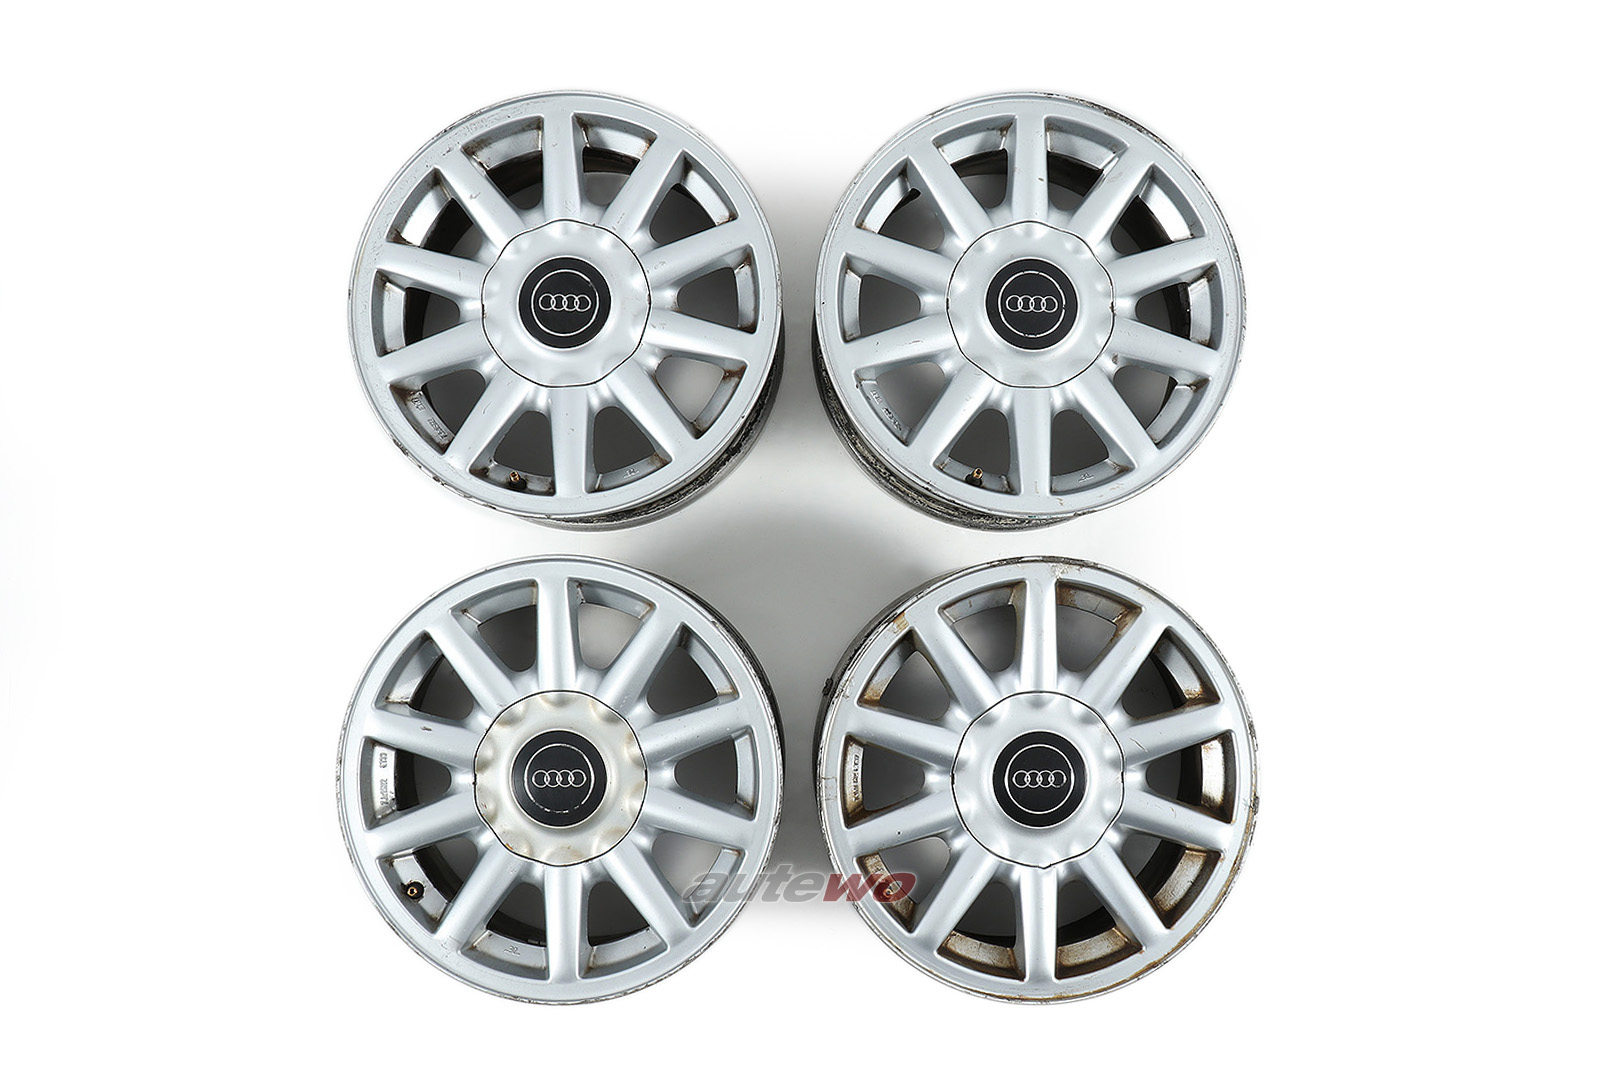 8A0601025C Audi 80 B4/Coupe/Cabrio 10-Speichen-Alufelgen 7x15 ET37 4x108